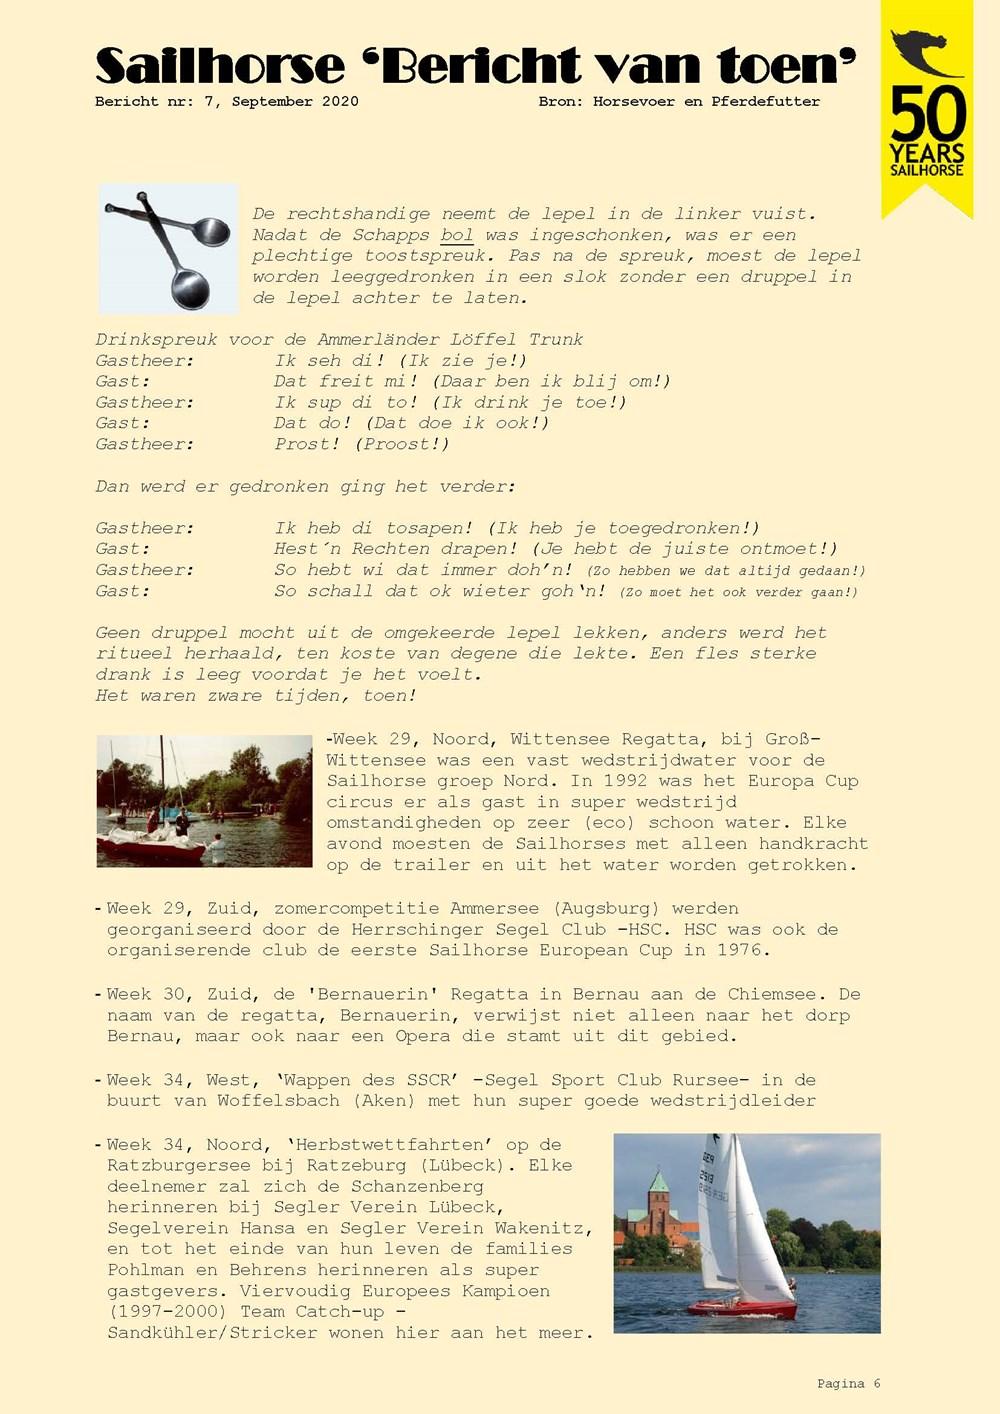 BvT7_Page_6.jpg